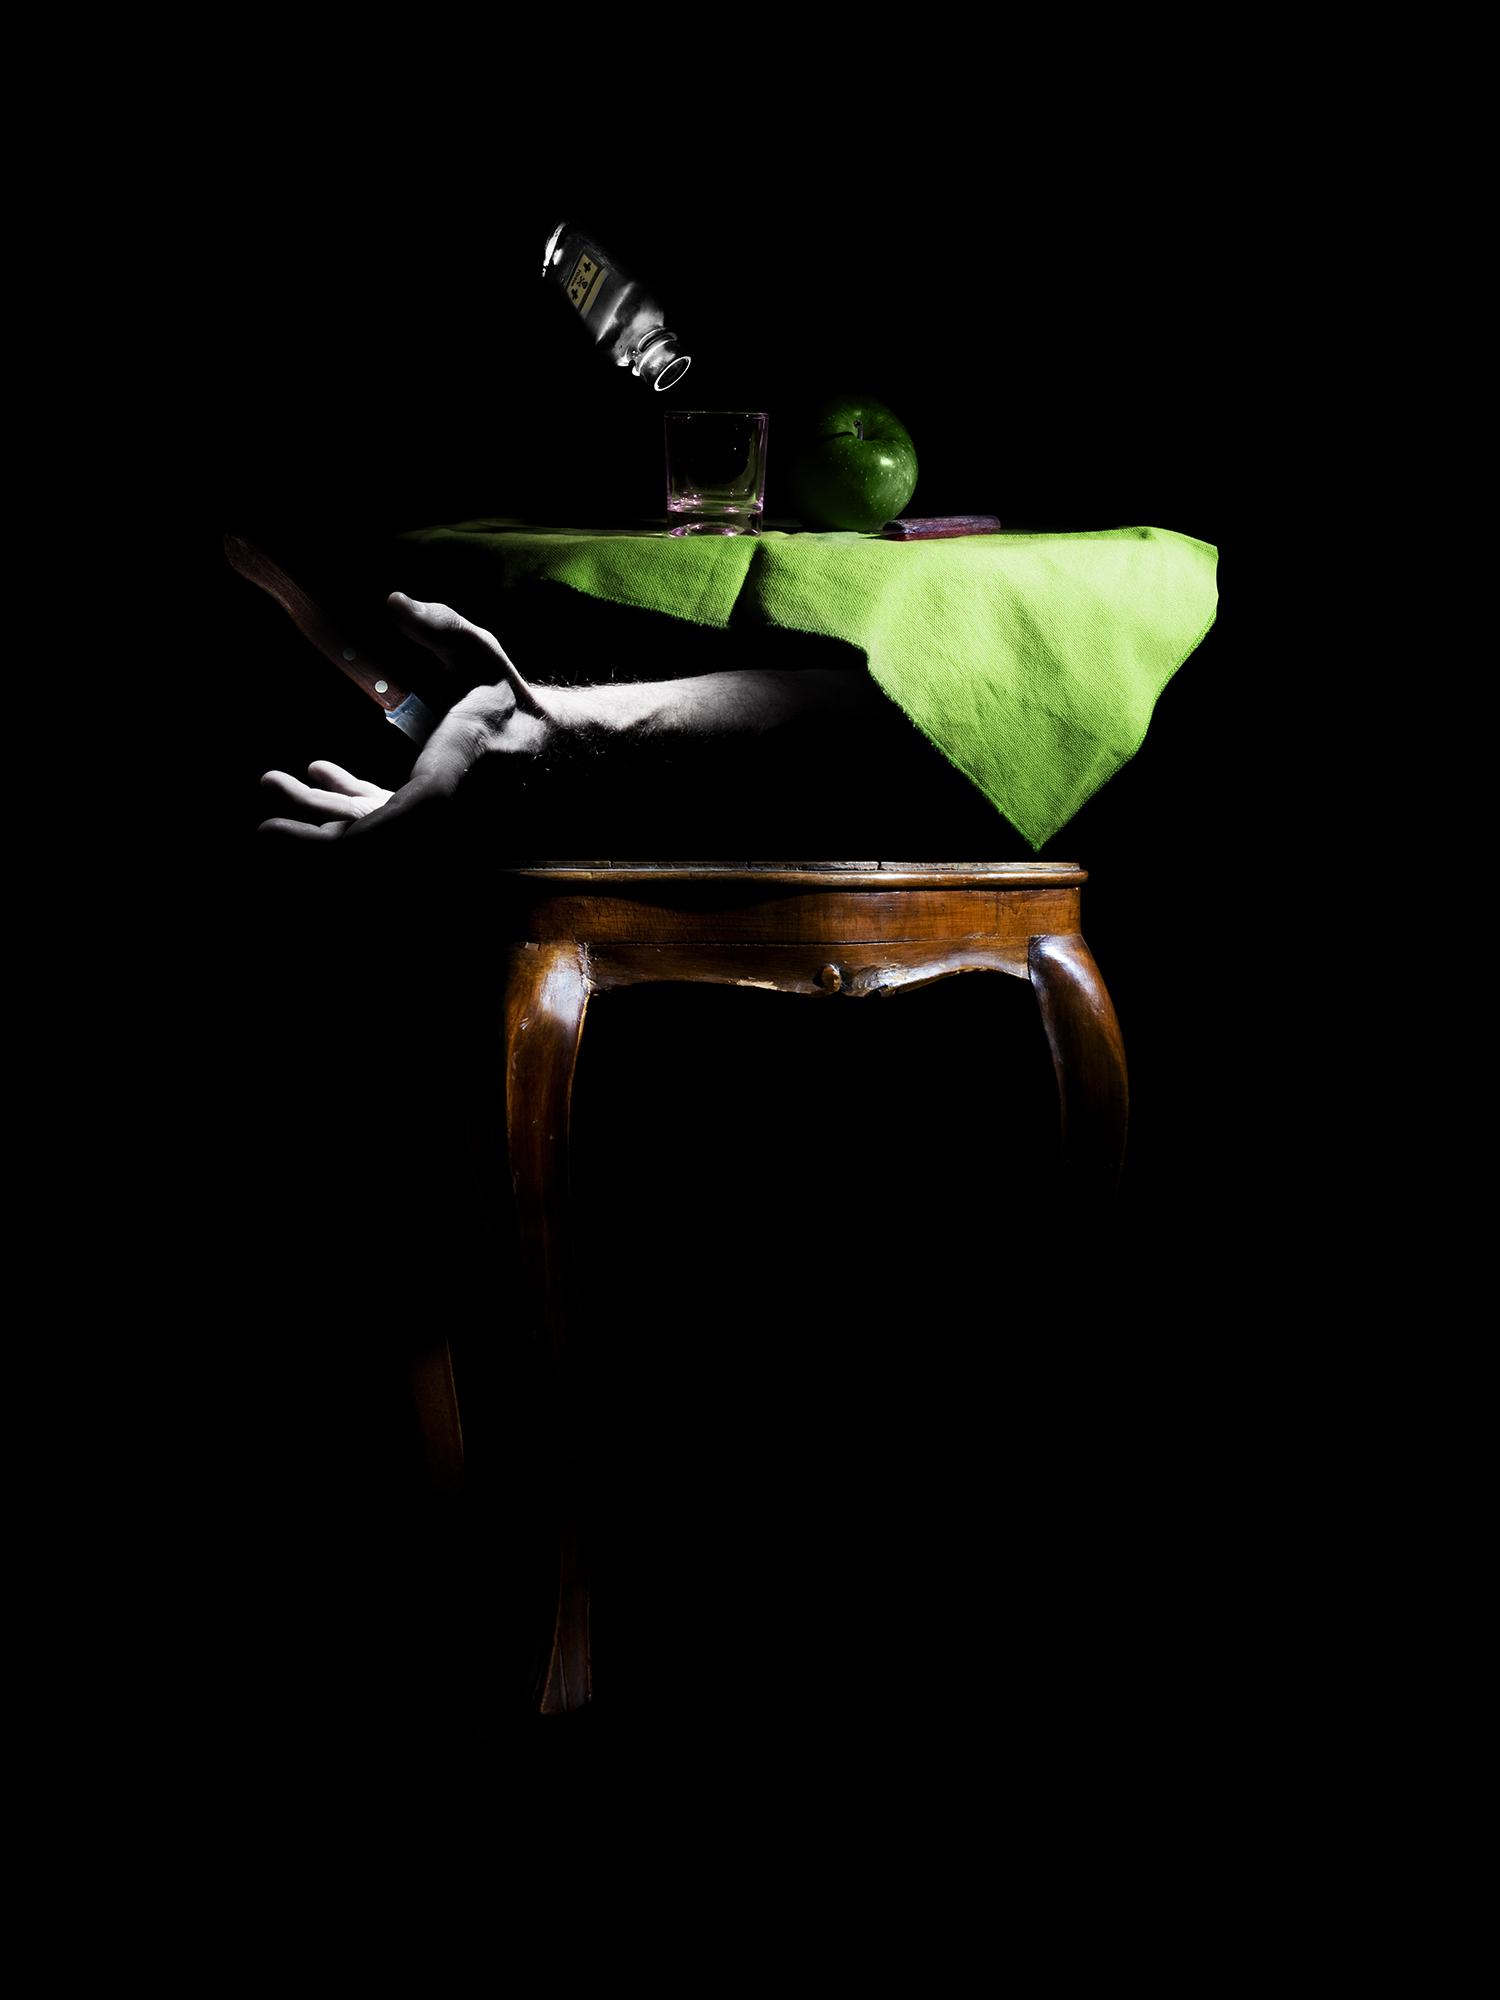 fra i due mali si sceglie il minore-30CM X 40CM / 50CM X 70CM / 70CM X 100CM – Print on FineArt Baryta Hahnemühle / dibond-©2009 – Edition of 5